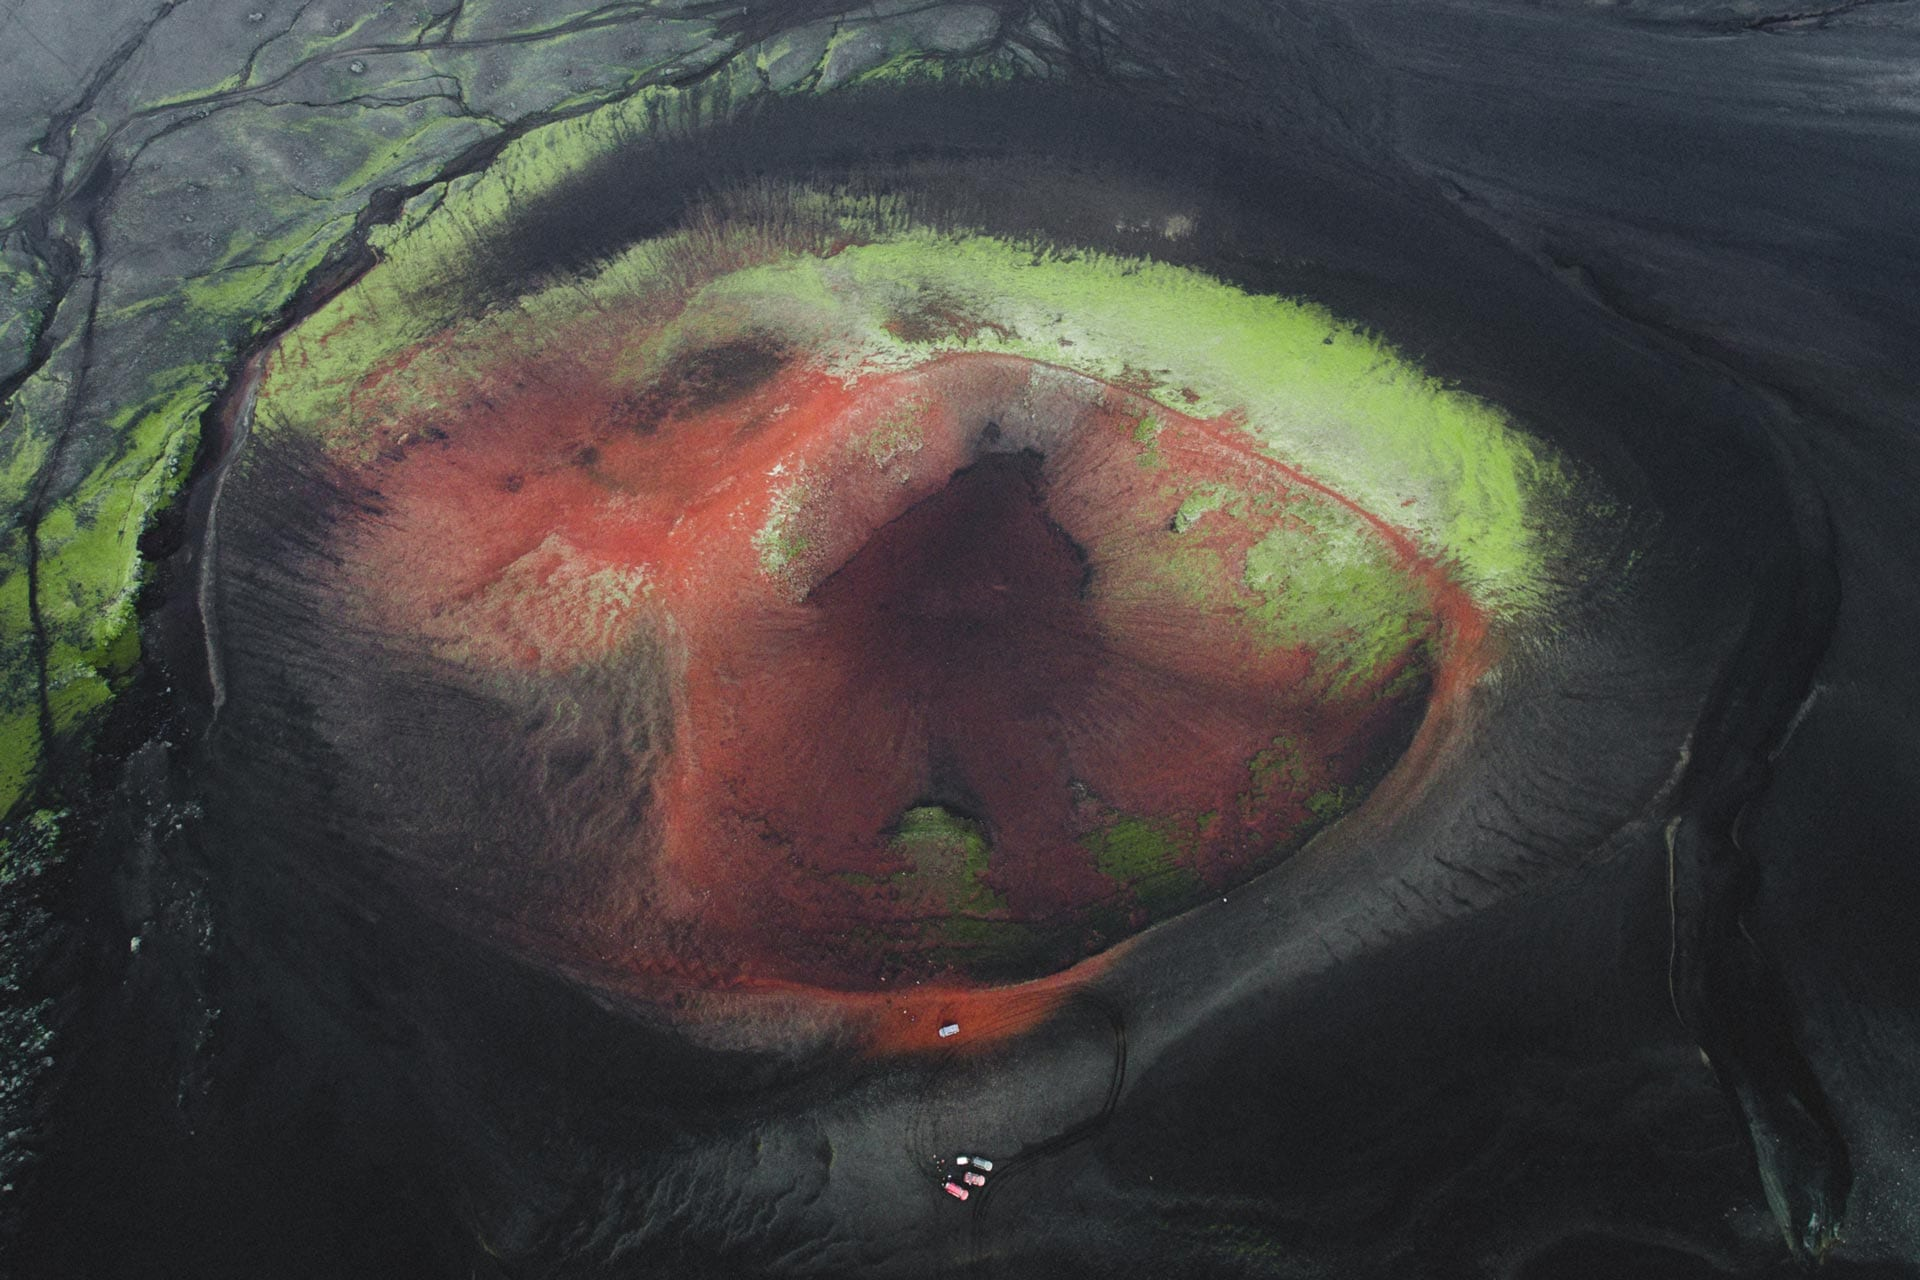 Mælifell volcano in Landmannalaugar